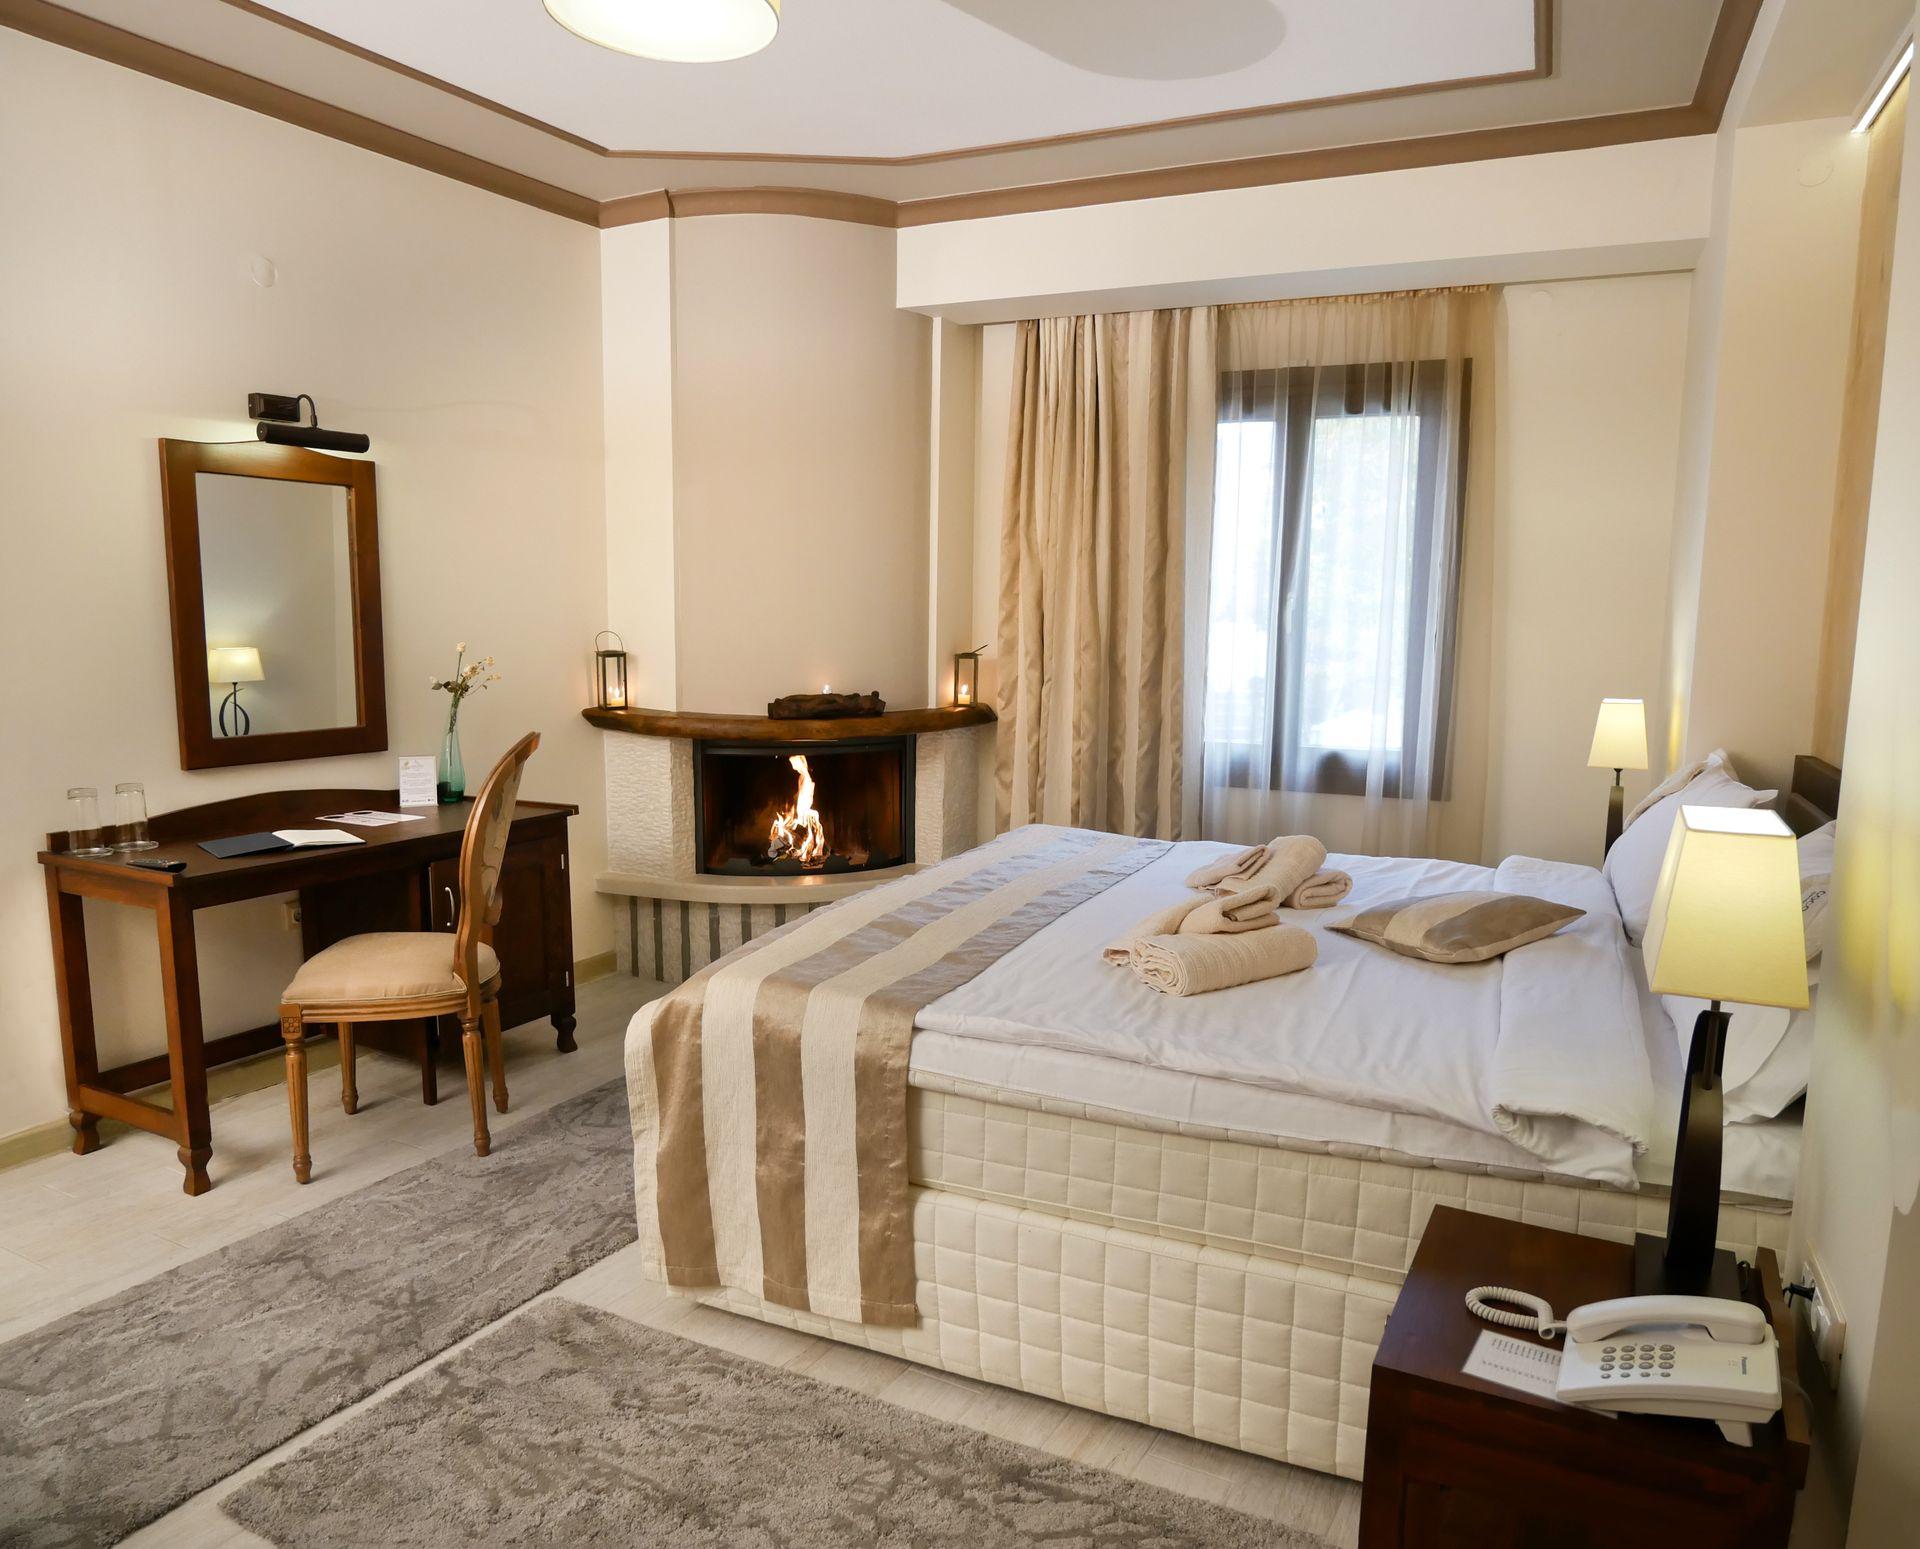 Rodovoli Hotel Konitsa - Κόνιτσα ✦ -25% ✦ 2 Ημέρες